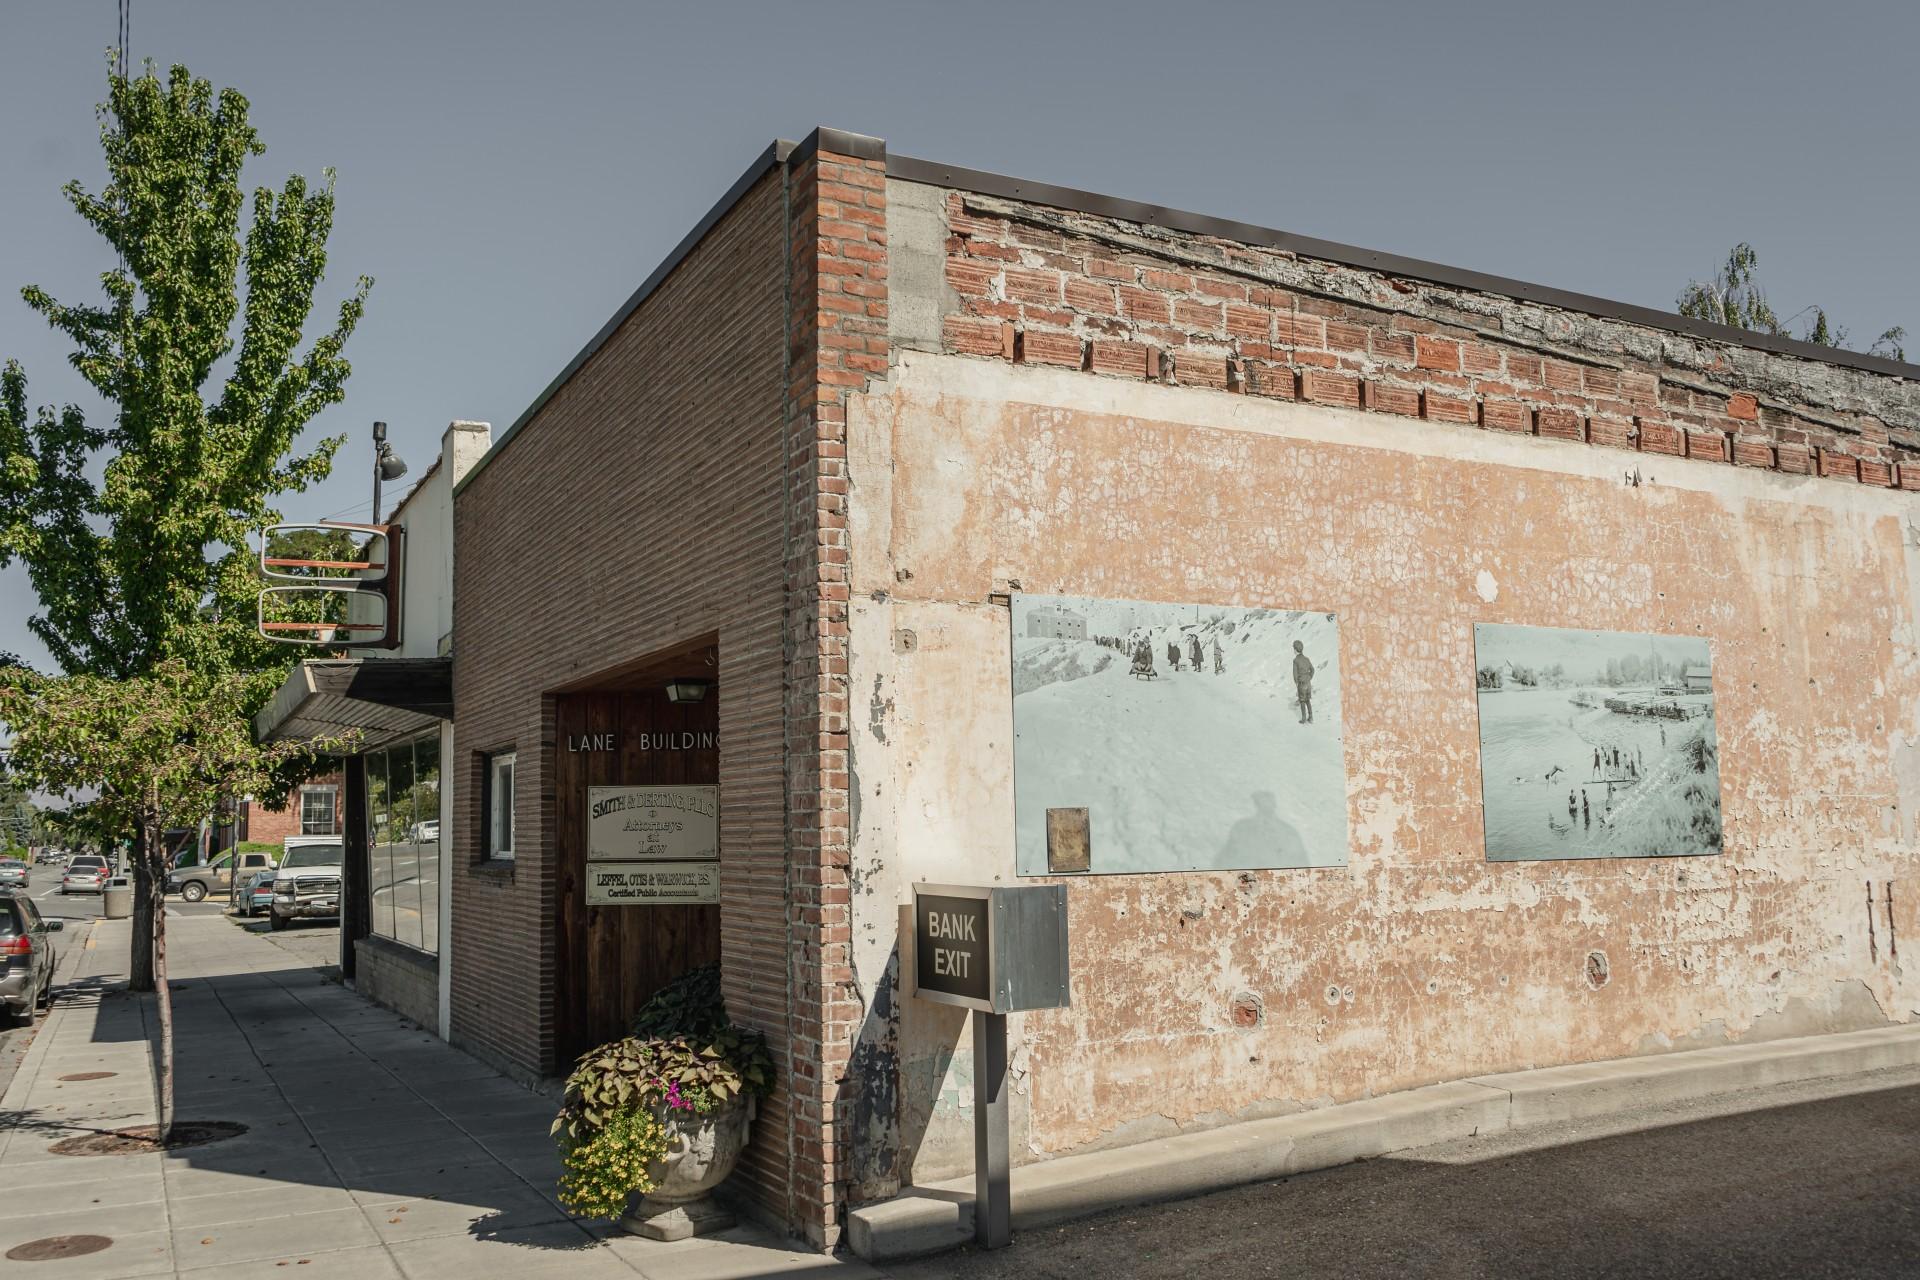 Omak Main Street Historical Photo Tour